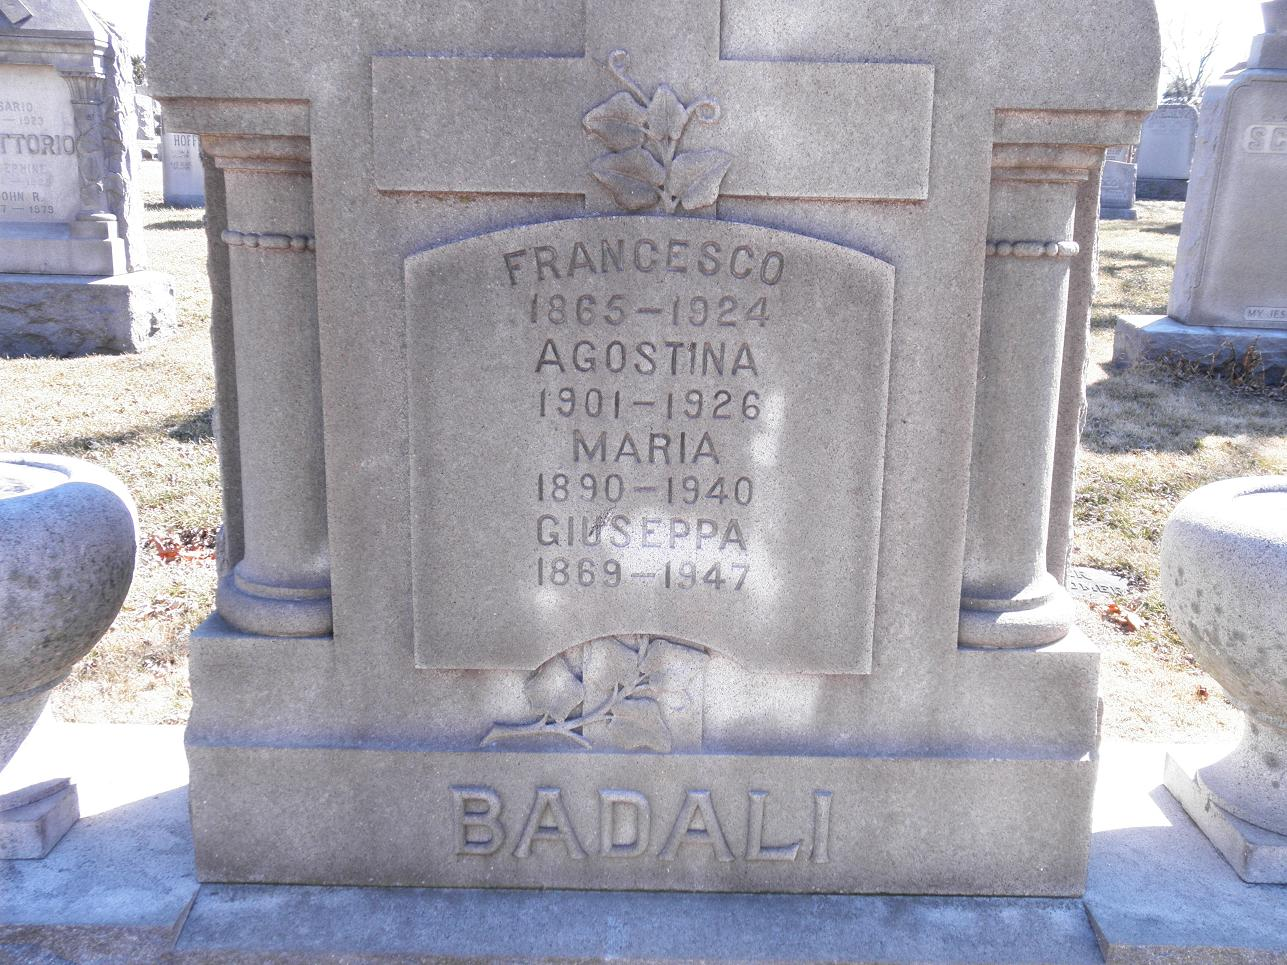 Maria Badali